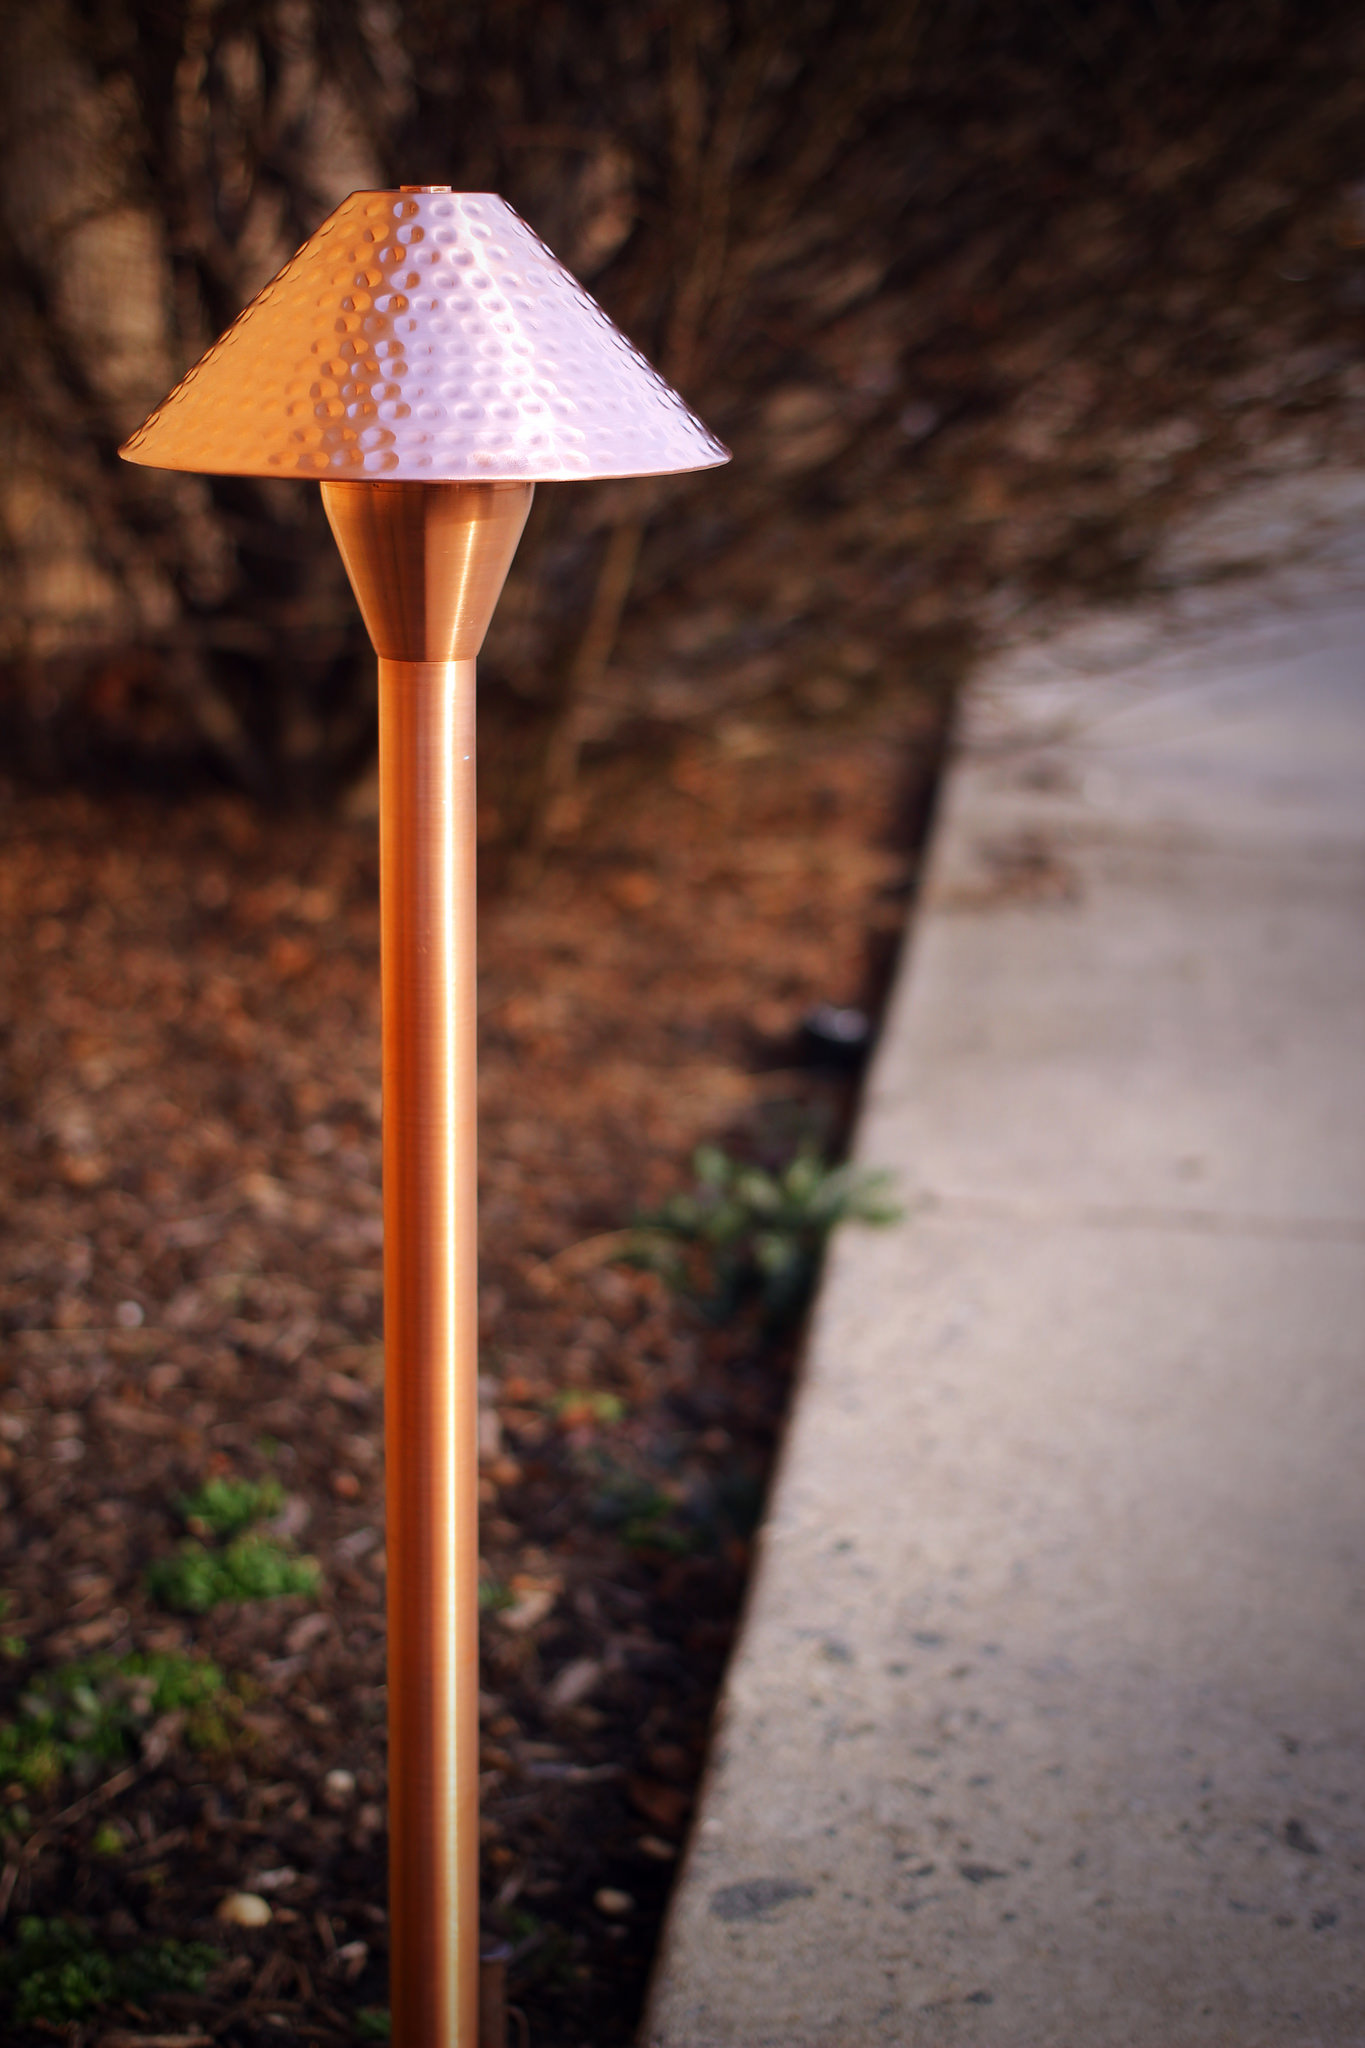 34614173795-coastal-source-hammered-path-light-in-copper.jpg